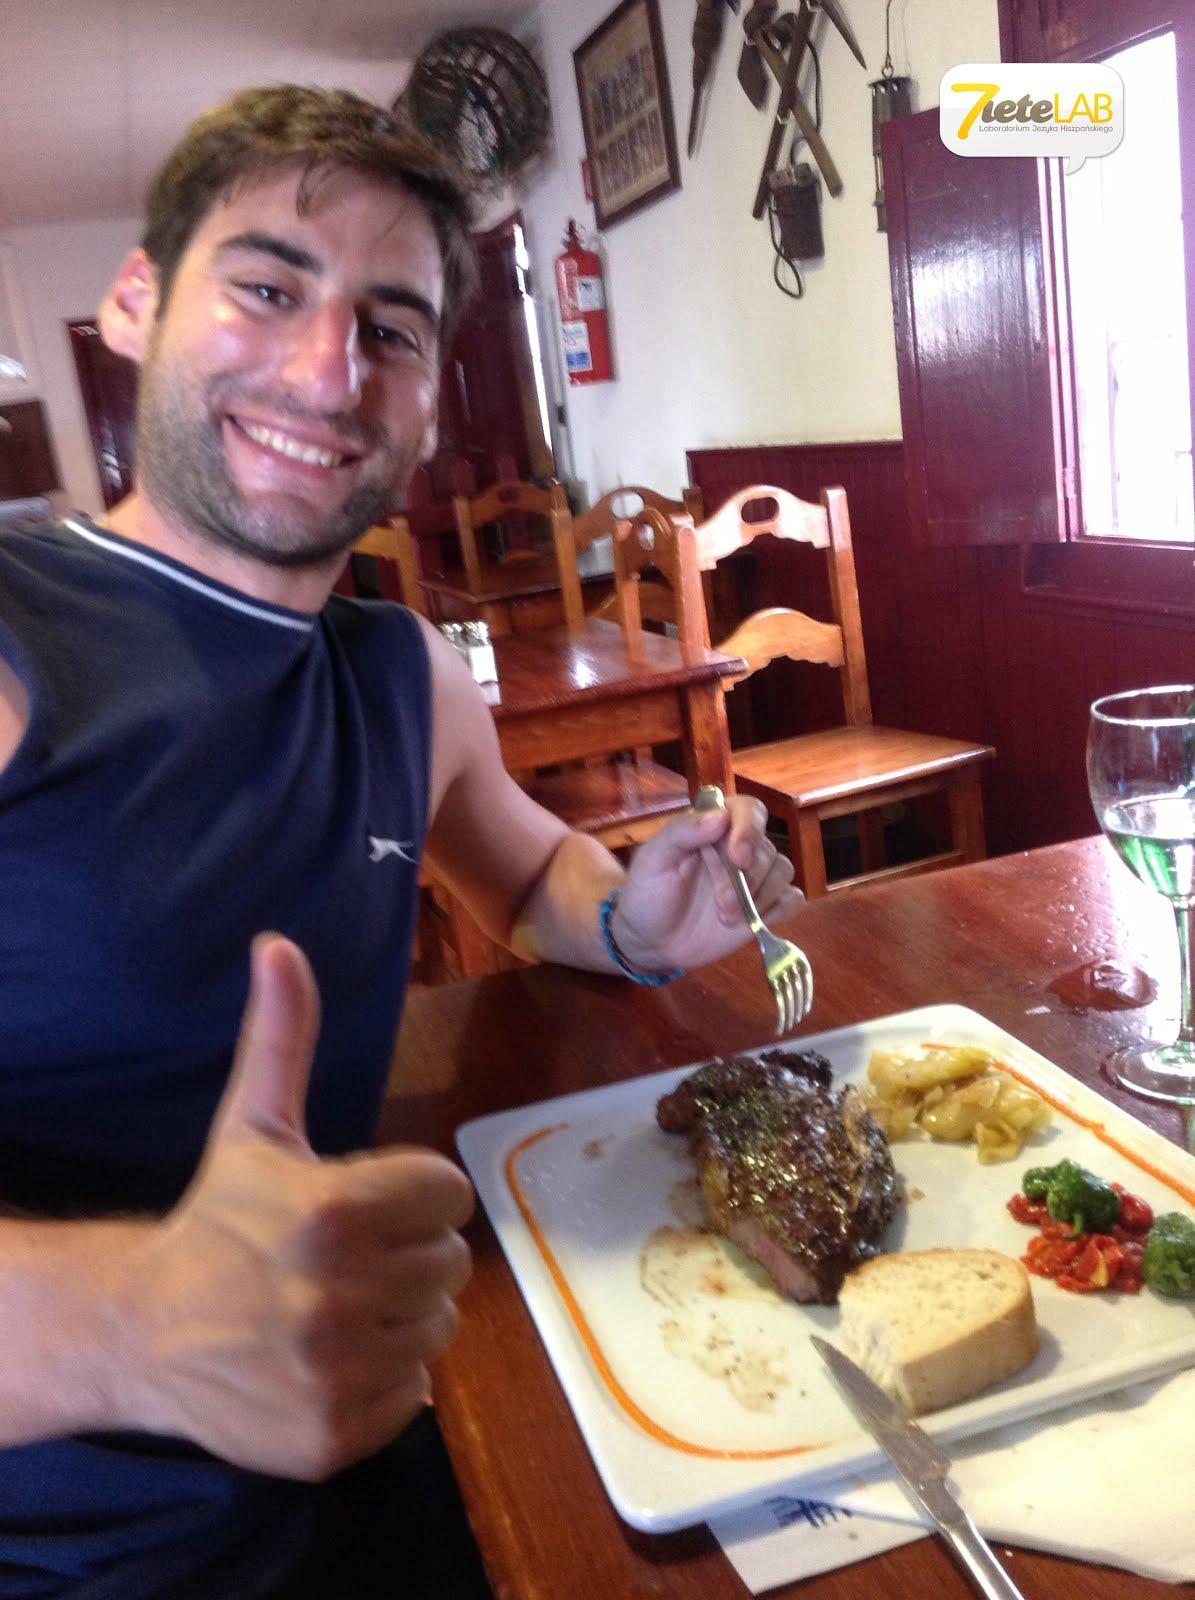 7ieteLAB español - Chuletón en la Sidrería Grill Las viñas (Playa Honda)